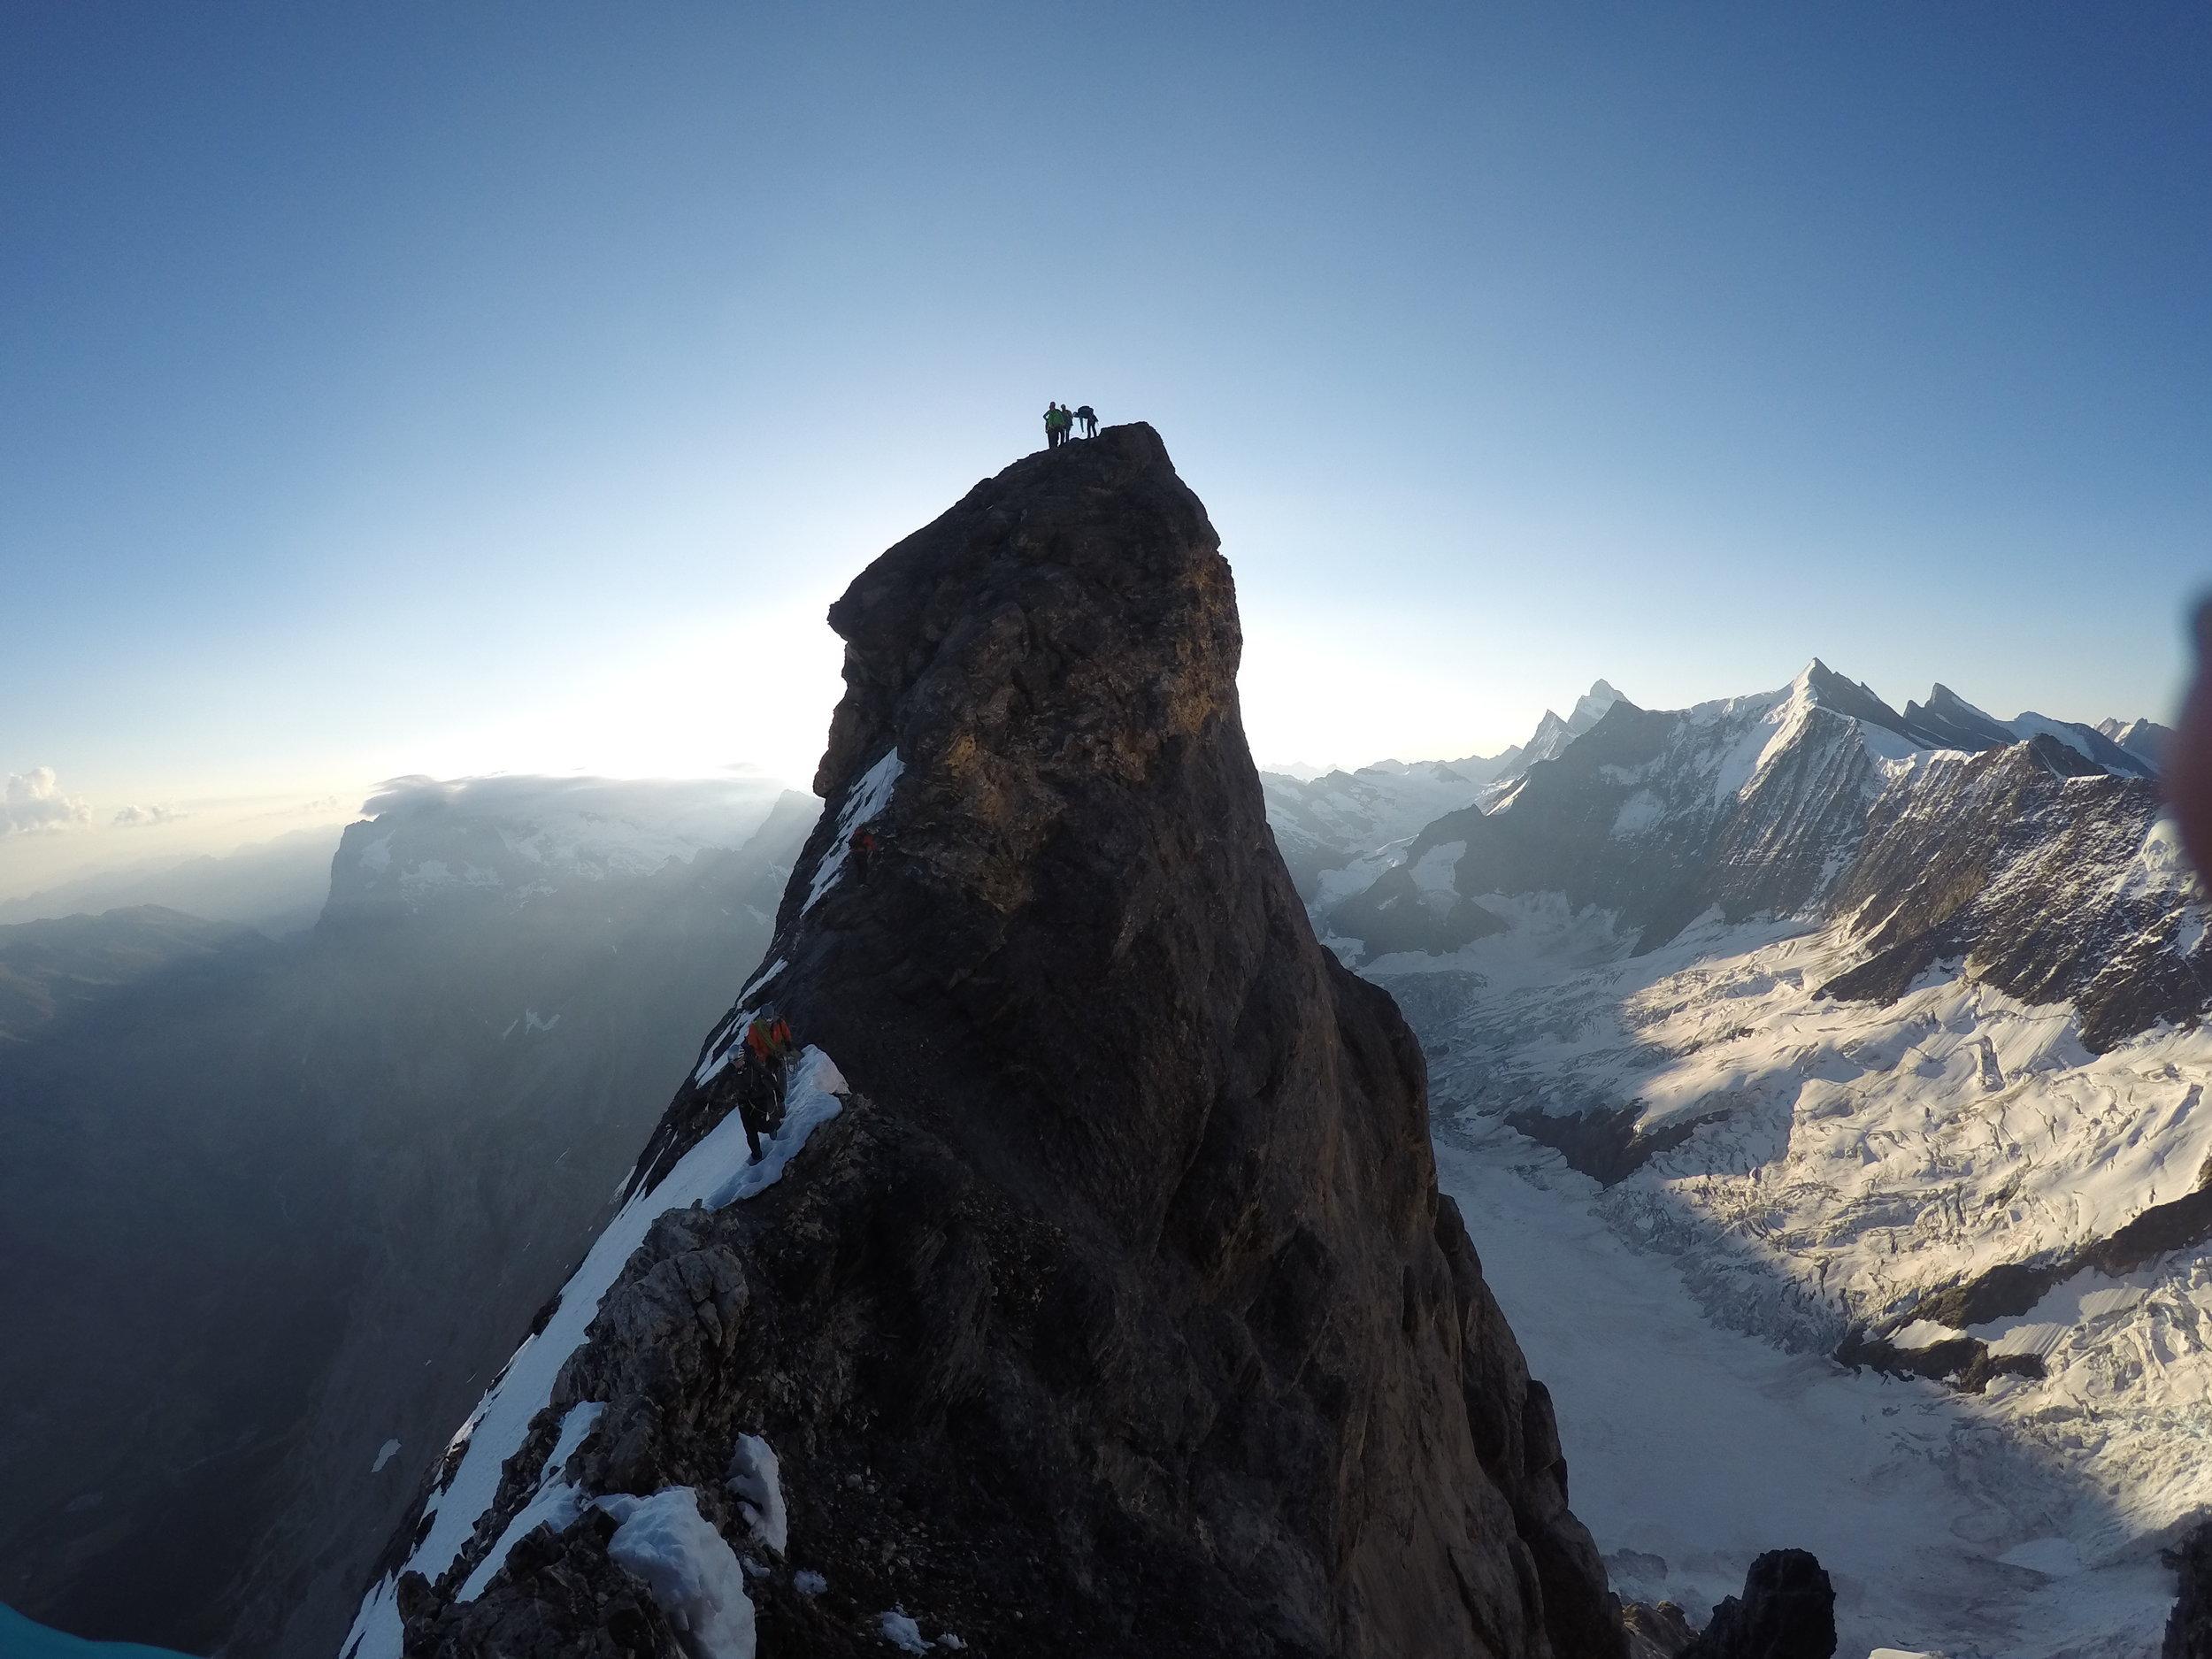 Famous Eiger, Mittellegi Ridge, 2016. Brilliant views with heart-stopping exposure.